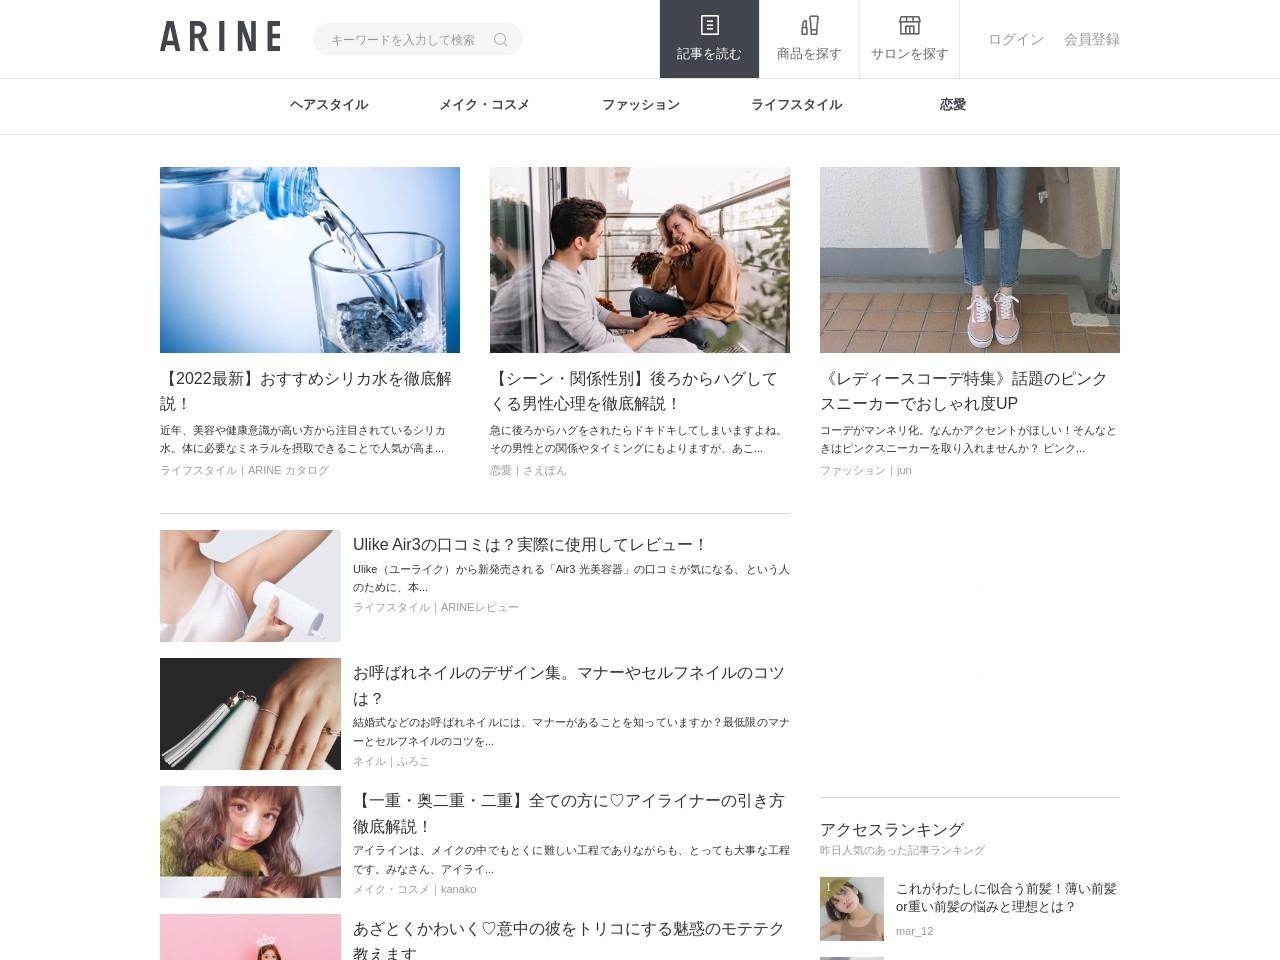 https://arine.jp/articles/12900